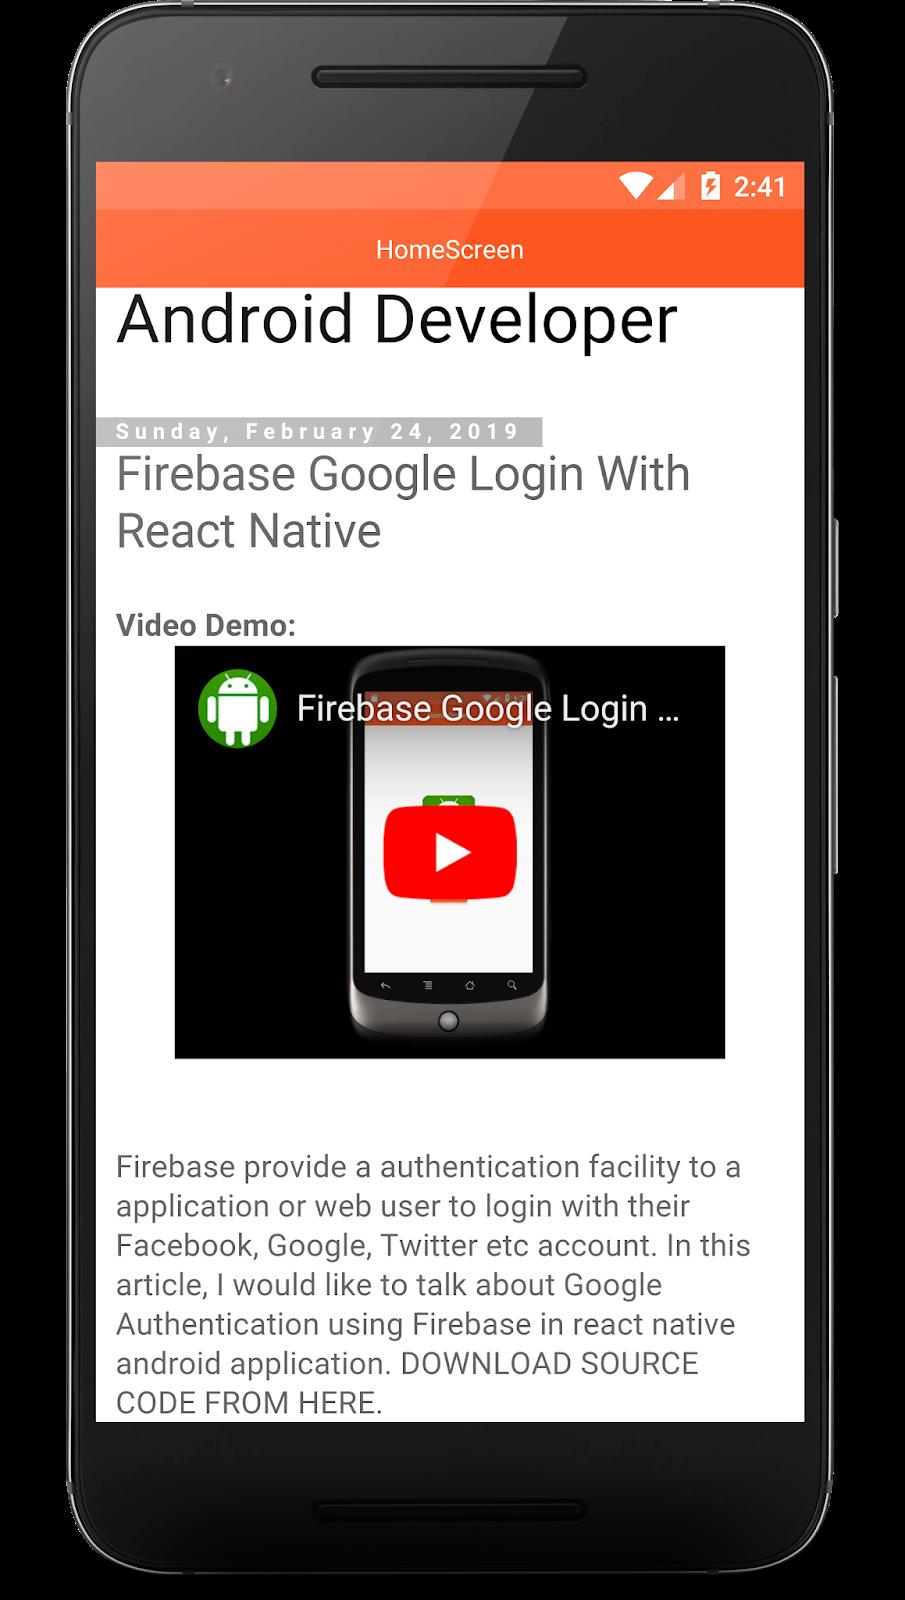 Deepshikha Puri: Android Developer